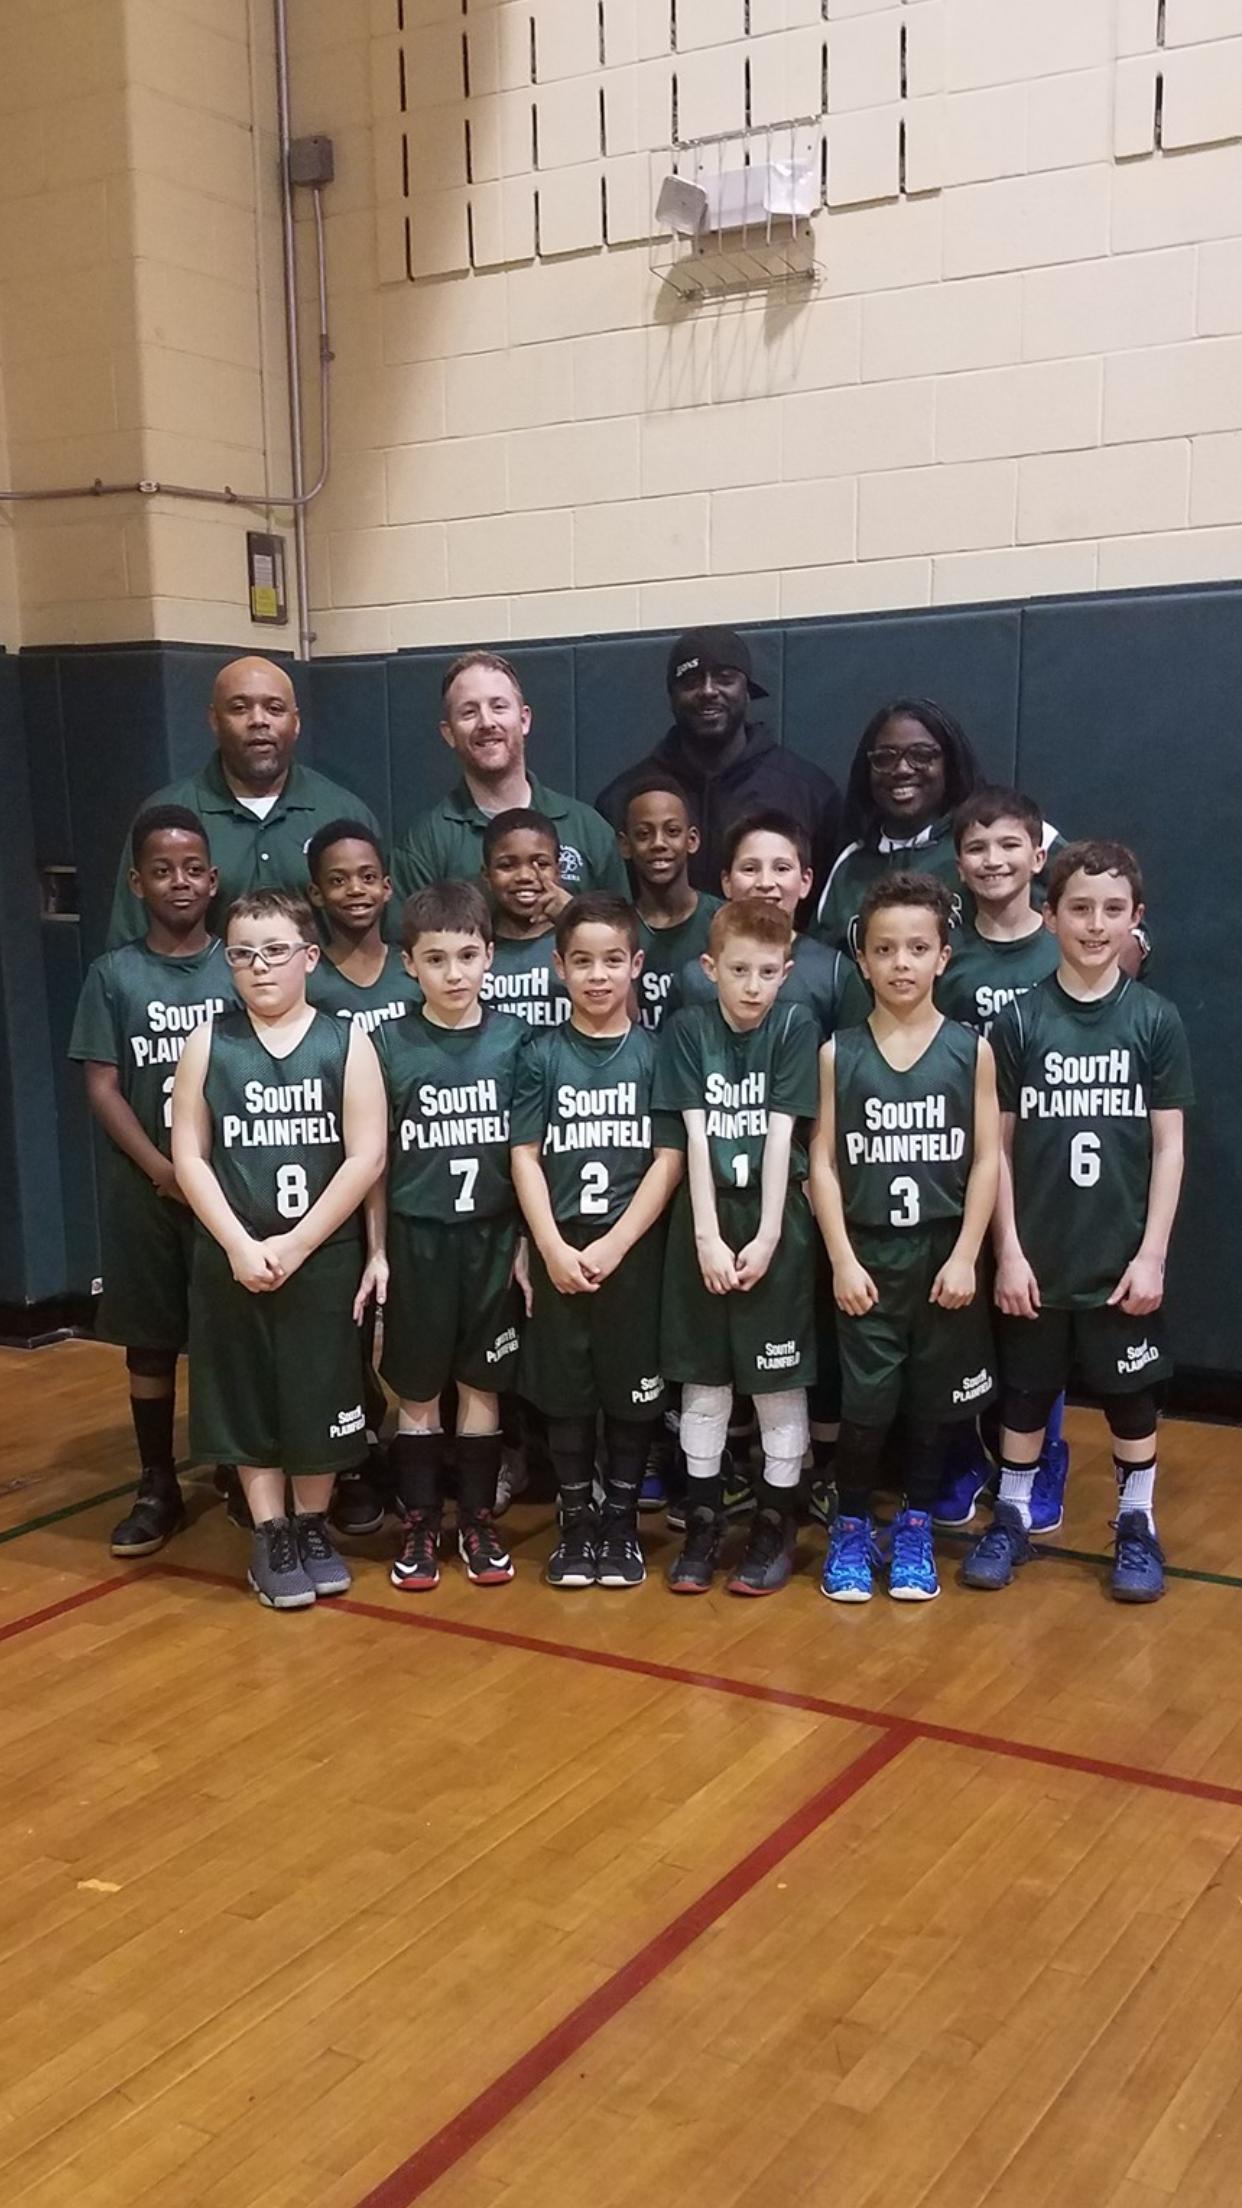 b9bc1c209c2aec7af3d3_South_Plainfield_4th_Grade_Basketball_Team.jpg